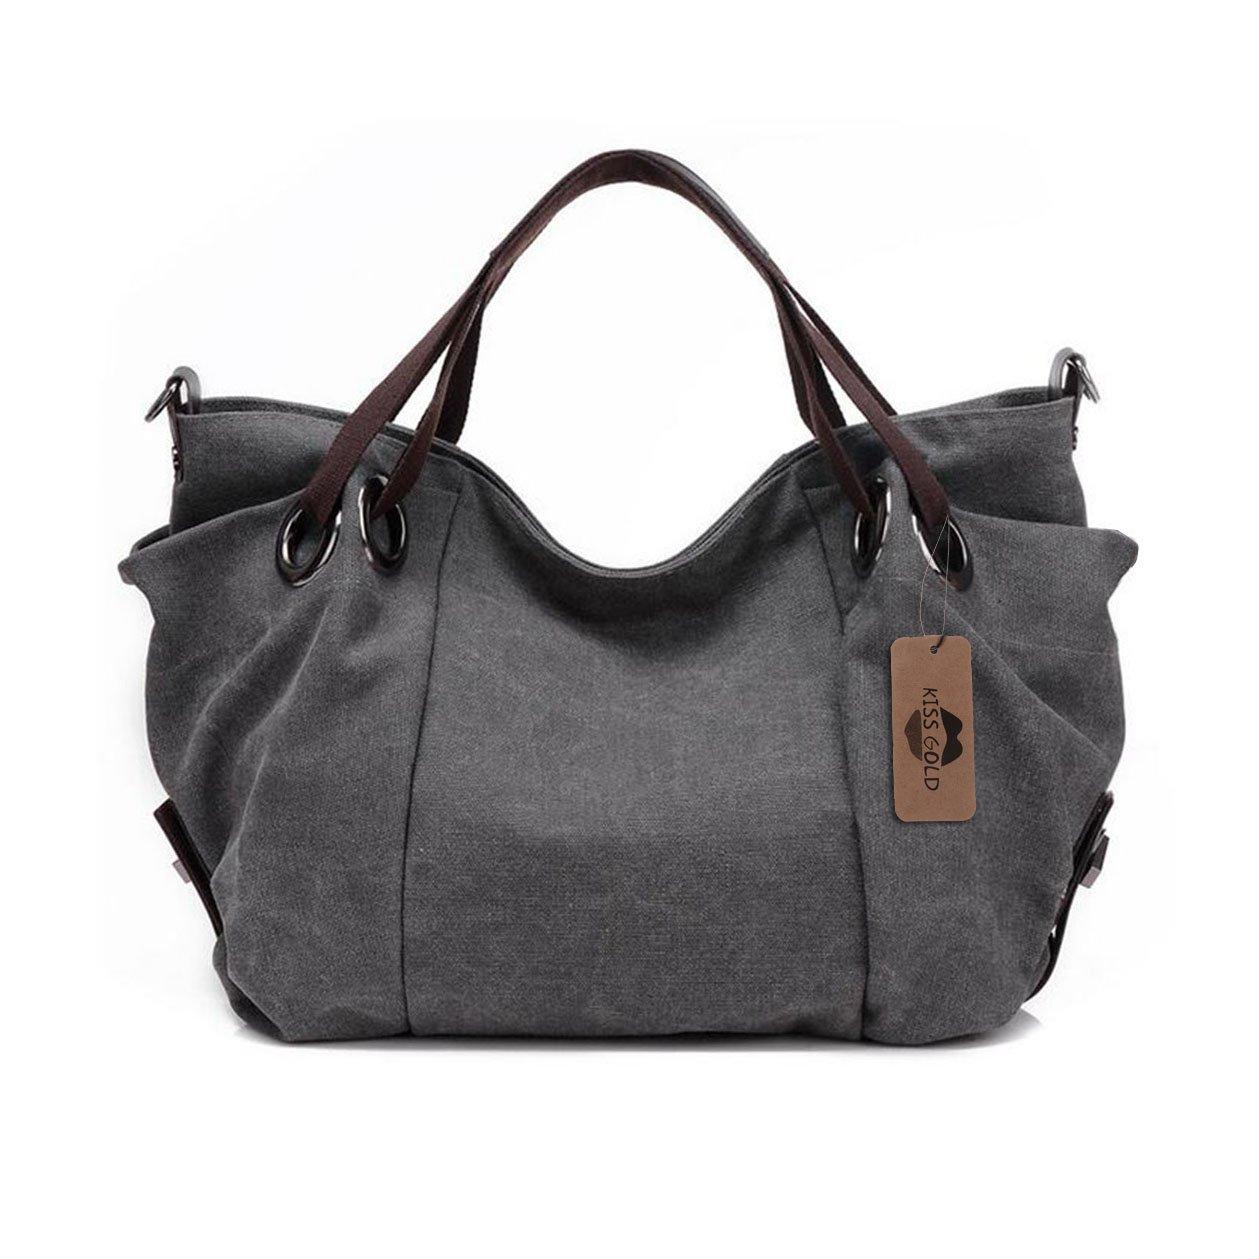 KISS GOLD(TM) Women's Canvas Hobo Top-handle Bag Crossbody Shoulder Bag, European Style, Large Size 16''X6.8''X12'', Grey